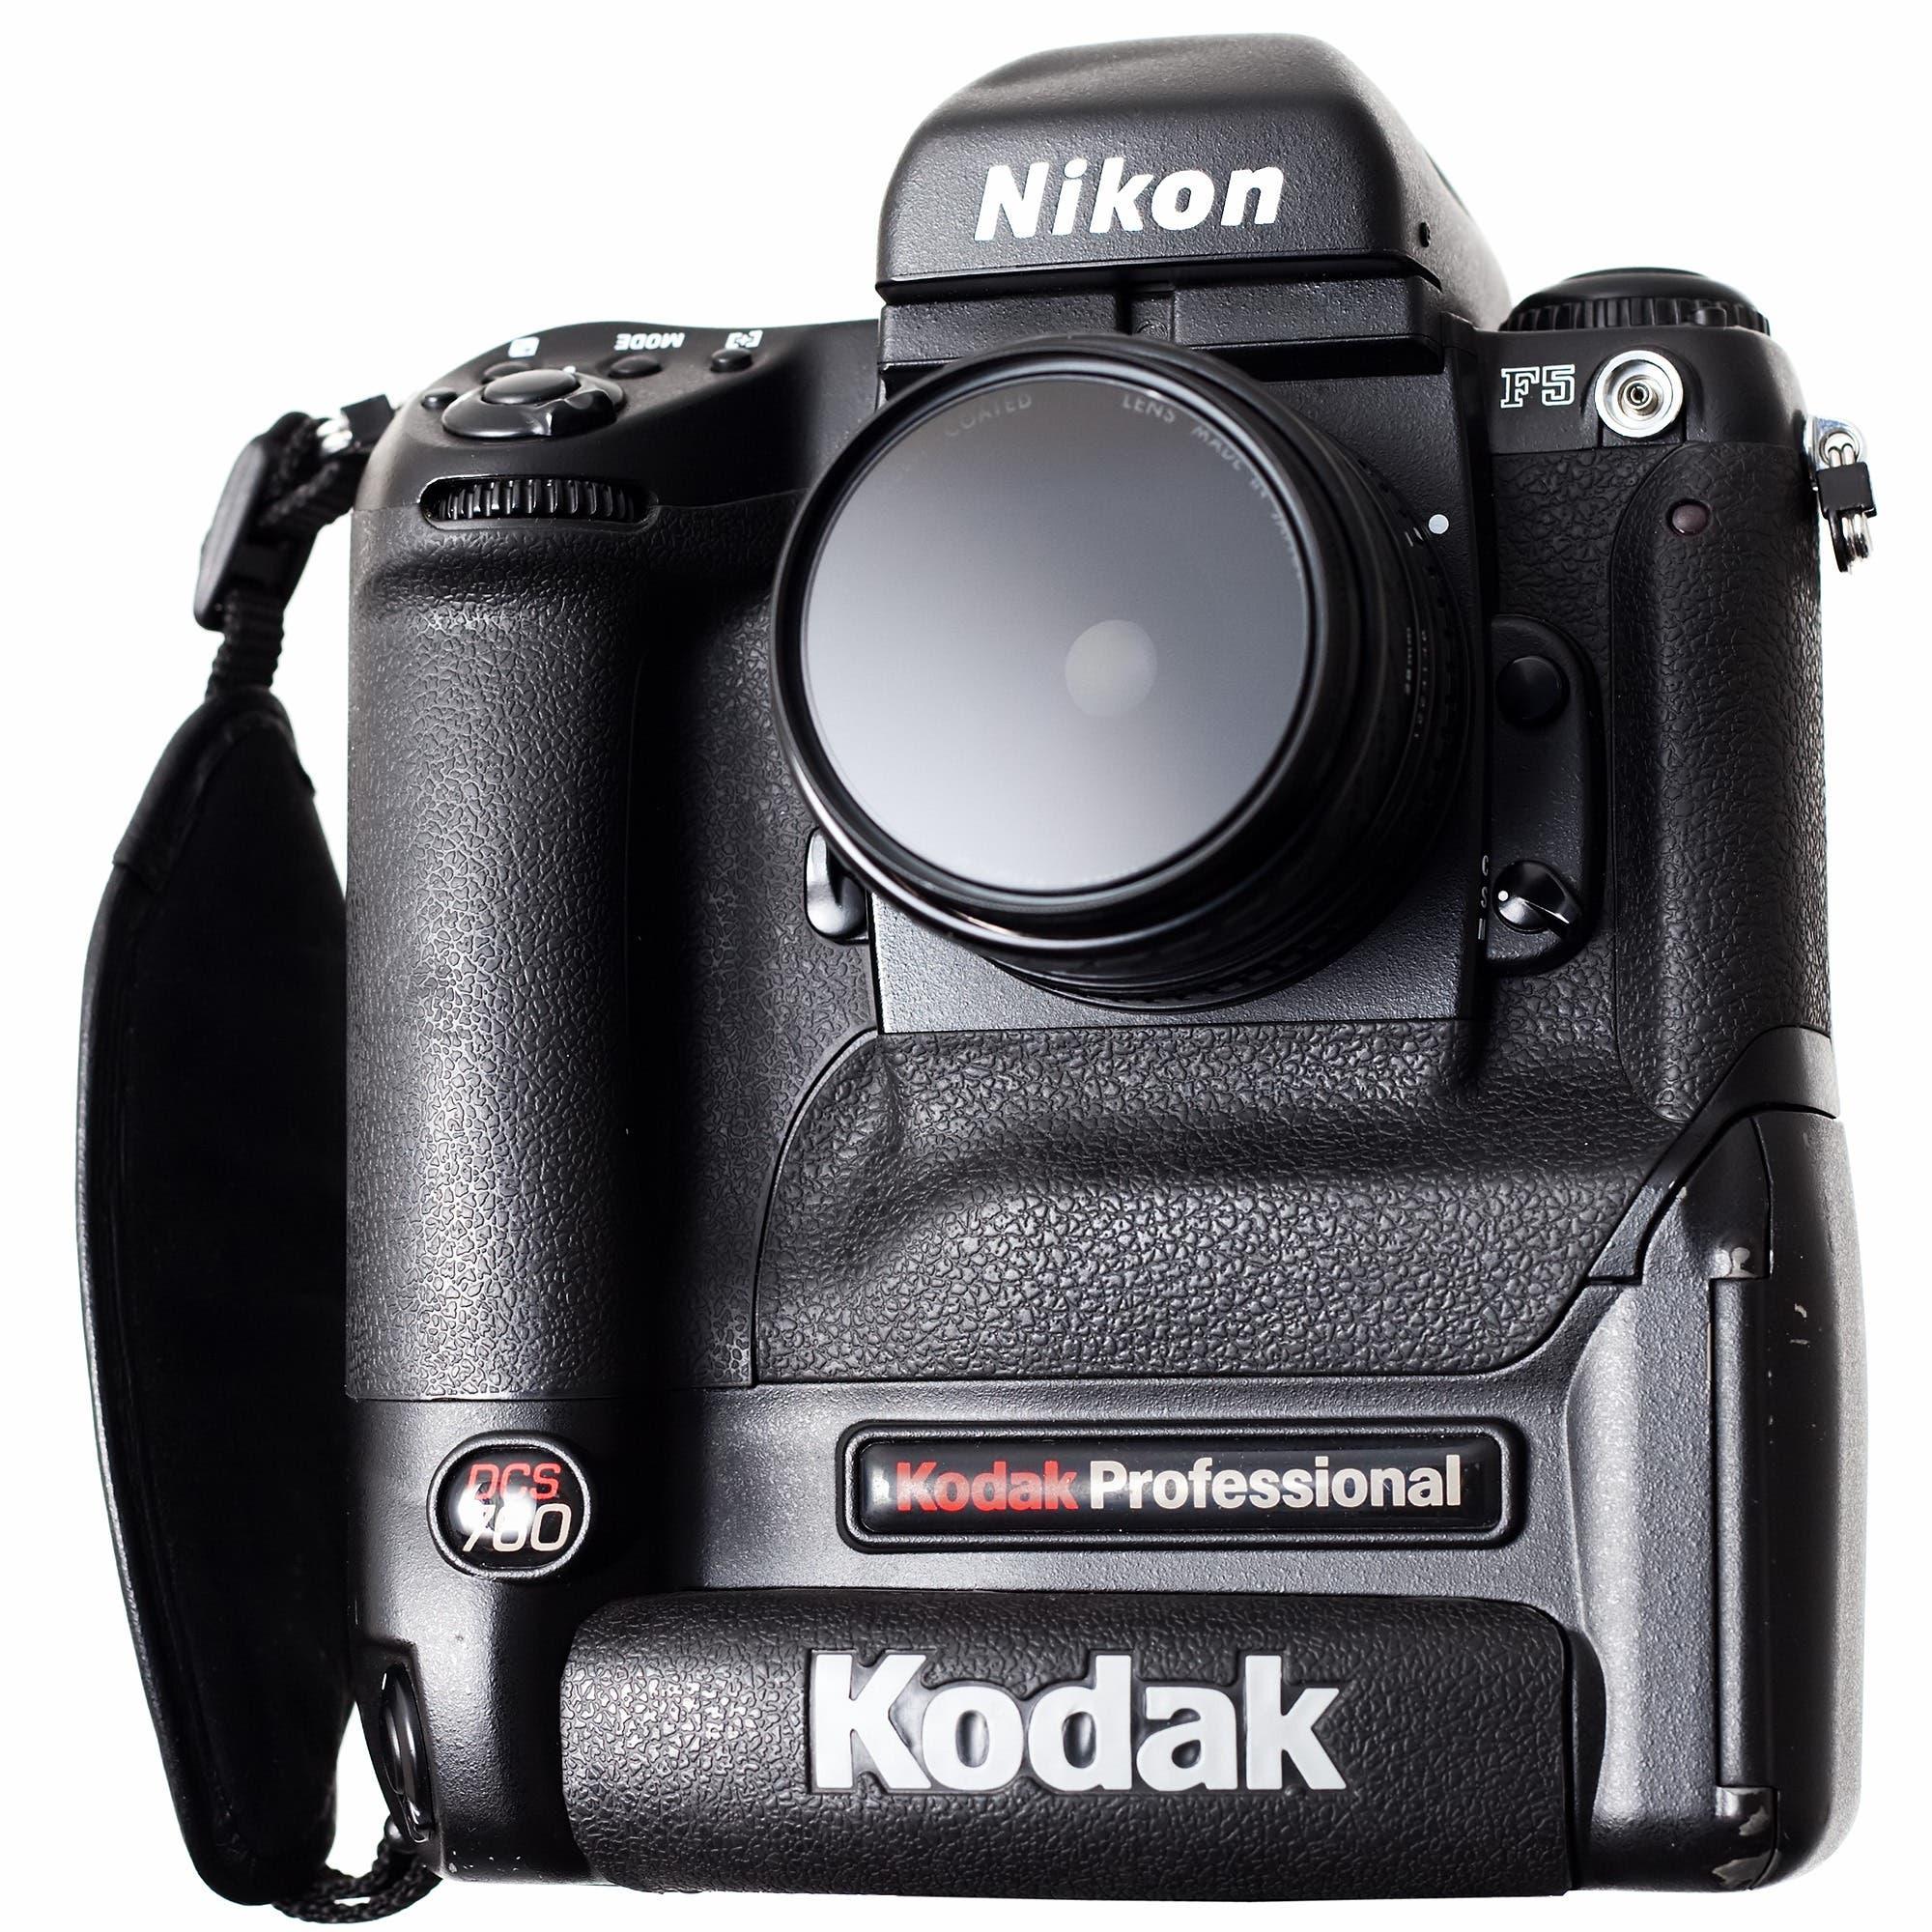 Kodak DCS 760 y Nikon F5